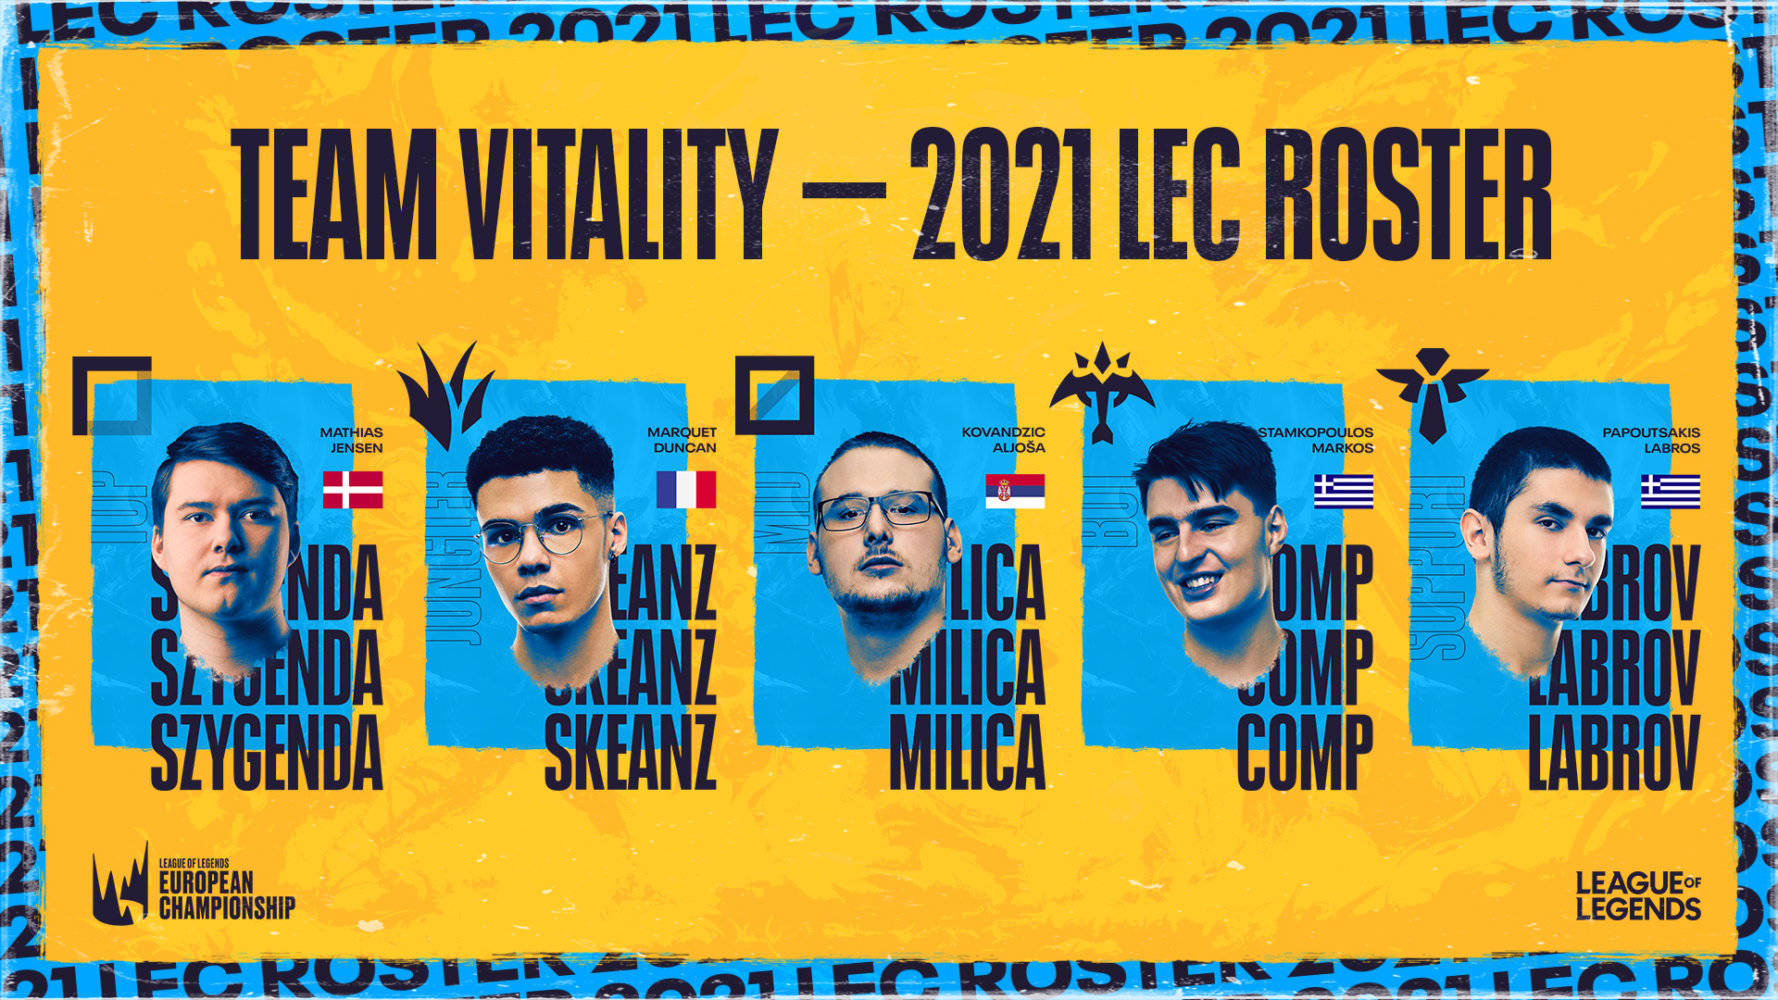 vitality lec roster